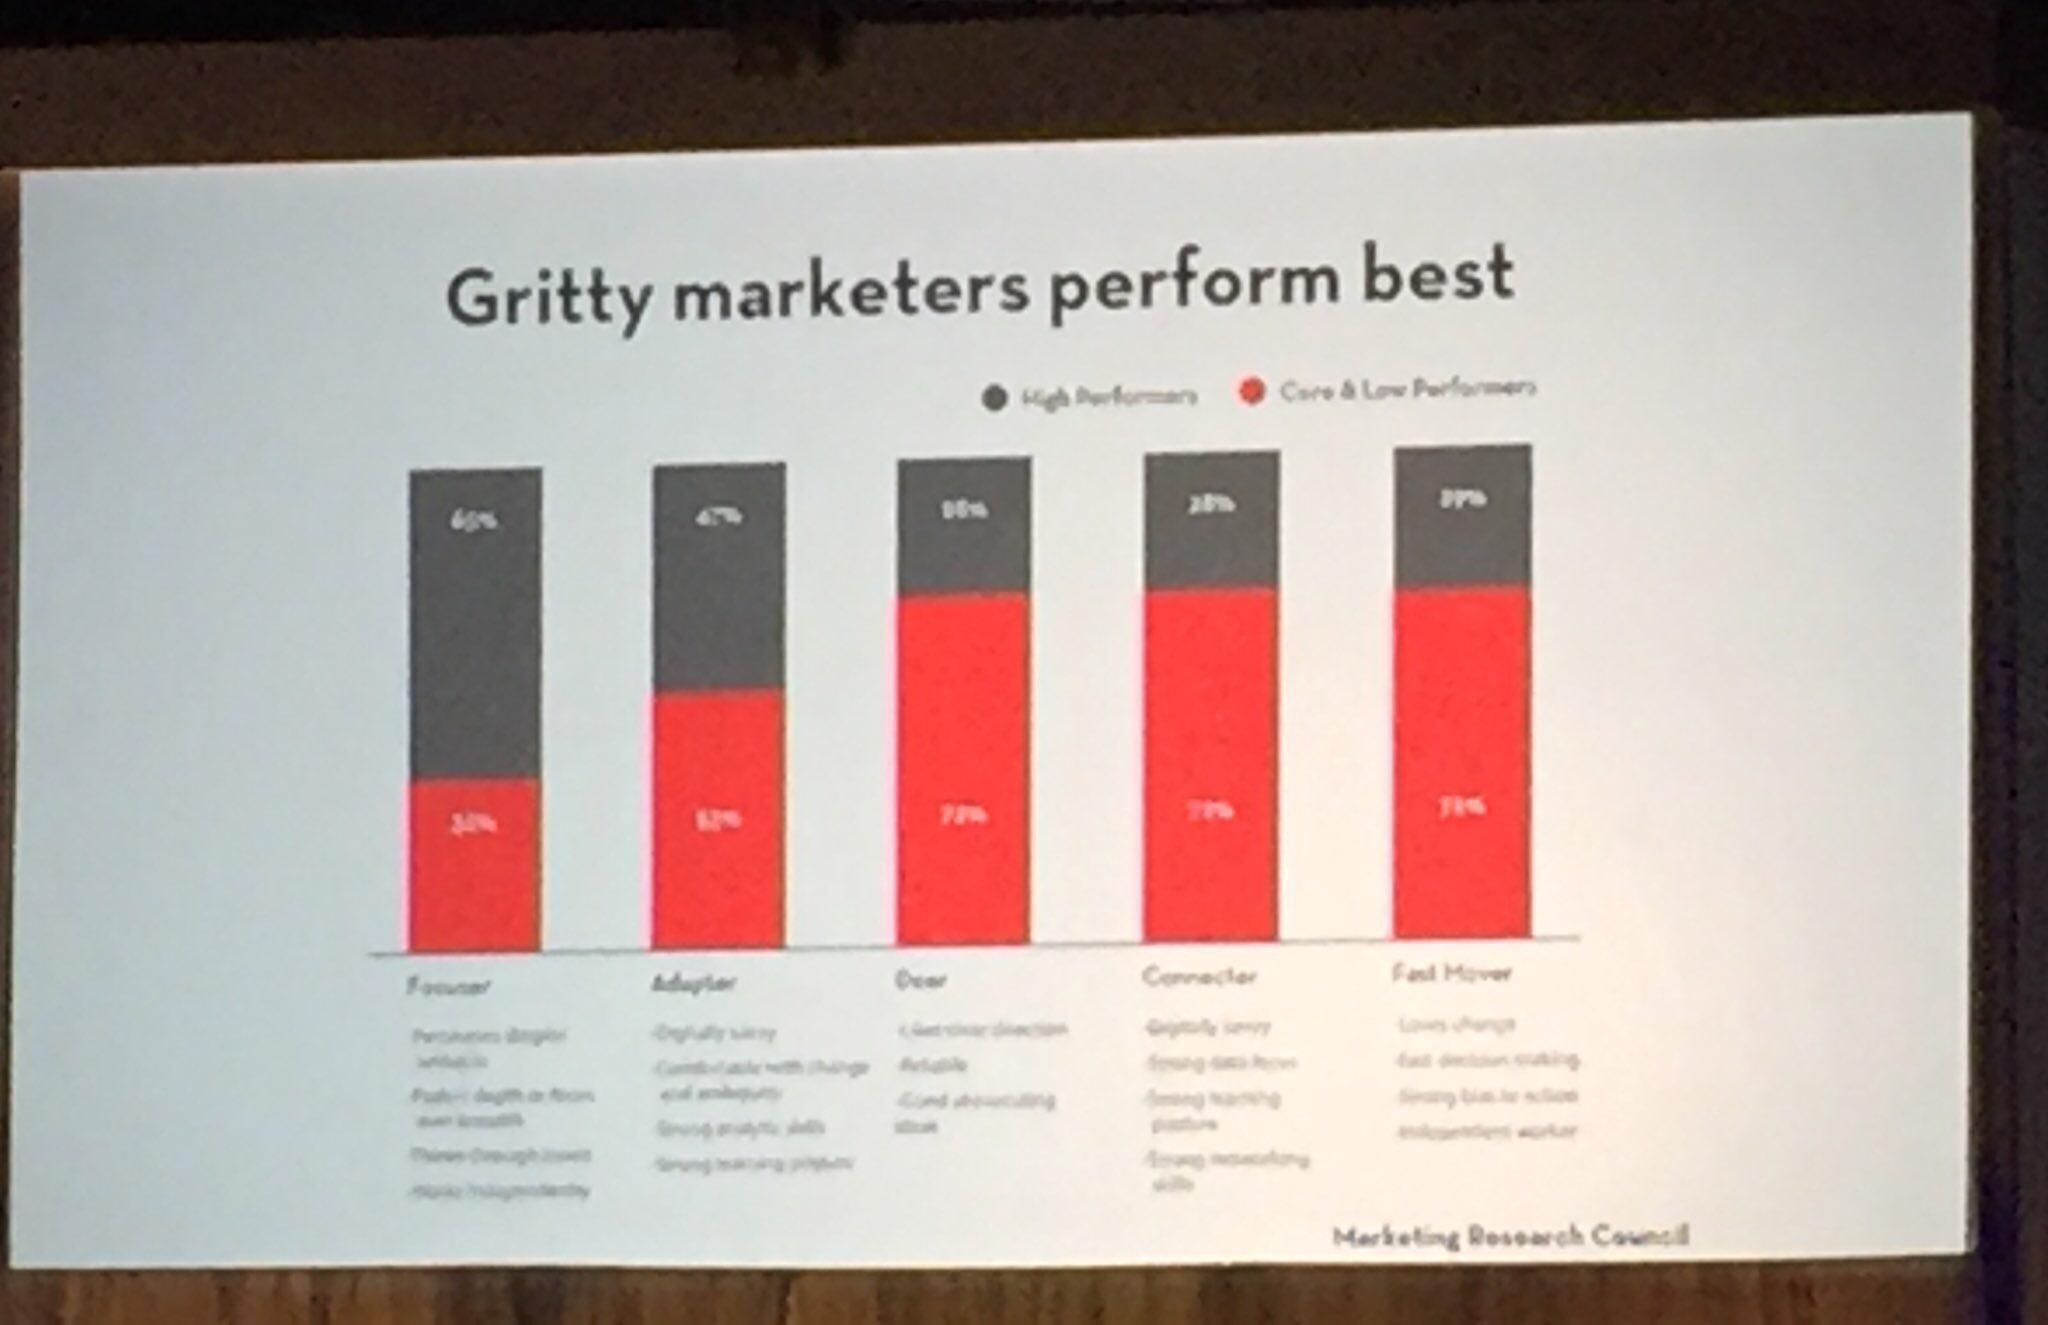 Gritty marketers perform best - Angela Duckworth